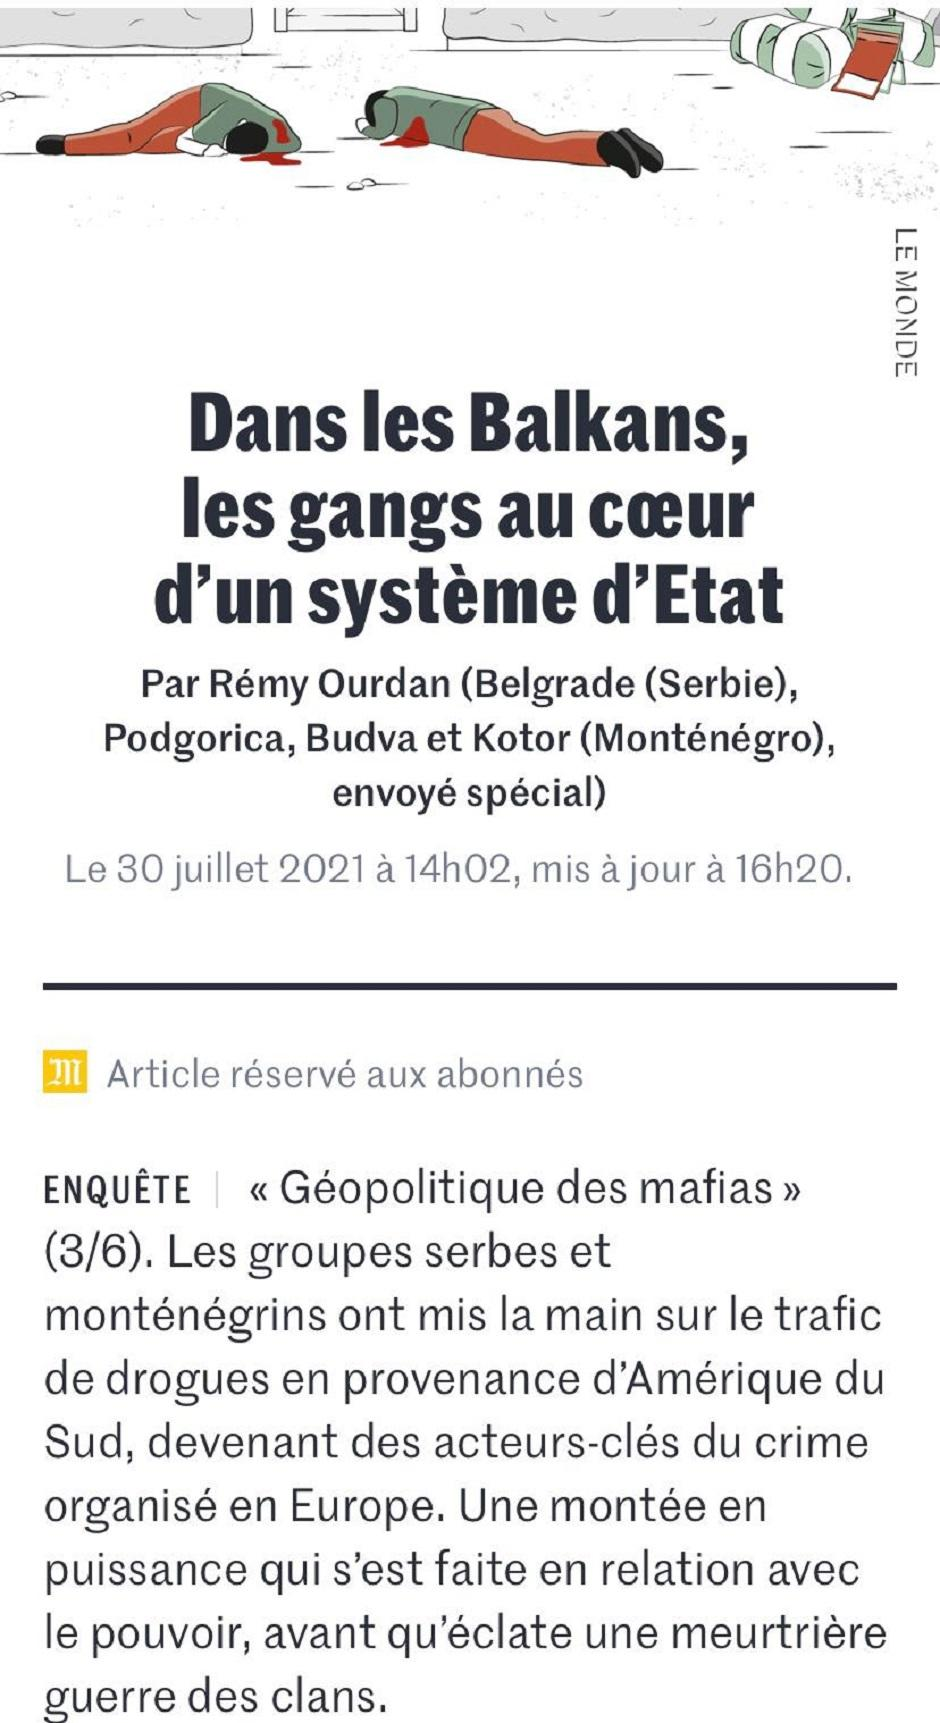 Francuski mediji o sprezi mafije i države FOTO: Printscreen